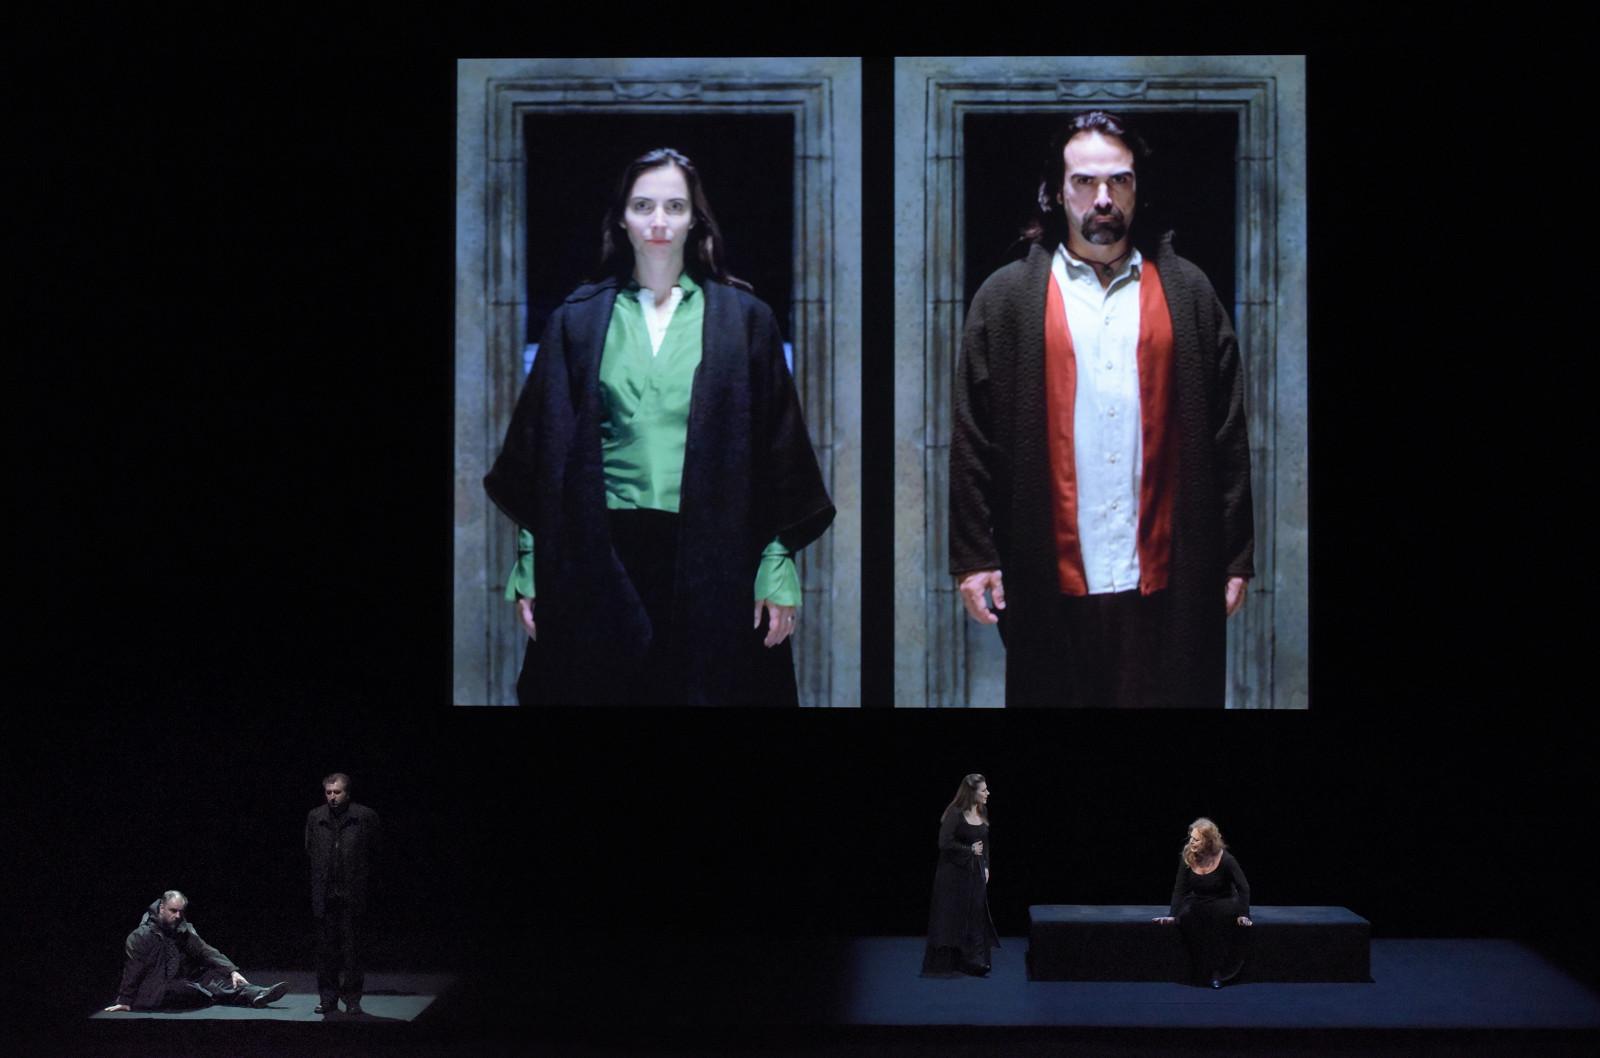 """Tristan et Isolde"" à l'Opéra-Bastille : Matthias Goerne (Kurwenal), Andreas Schager (Tristan), Ekaterina Gubanova (Brangäne), Martina-Serafin (Isolde) / © Vincent Pontet (OnP) Tristan-et-Isolde"